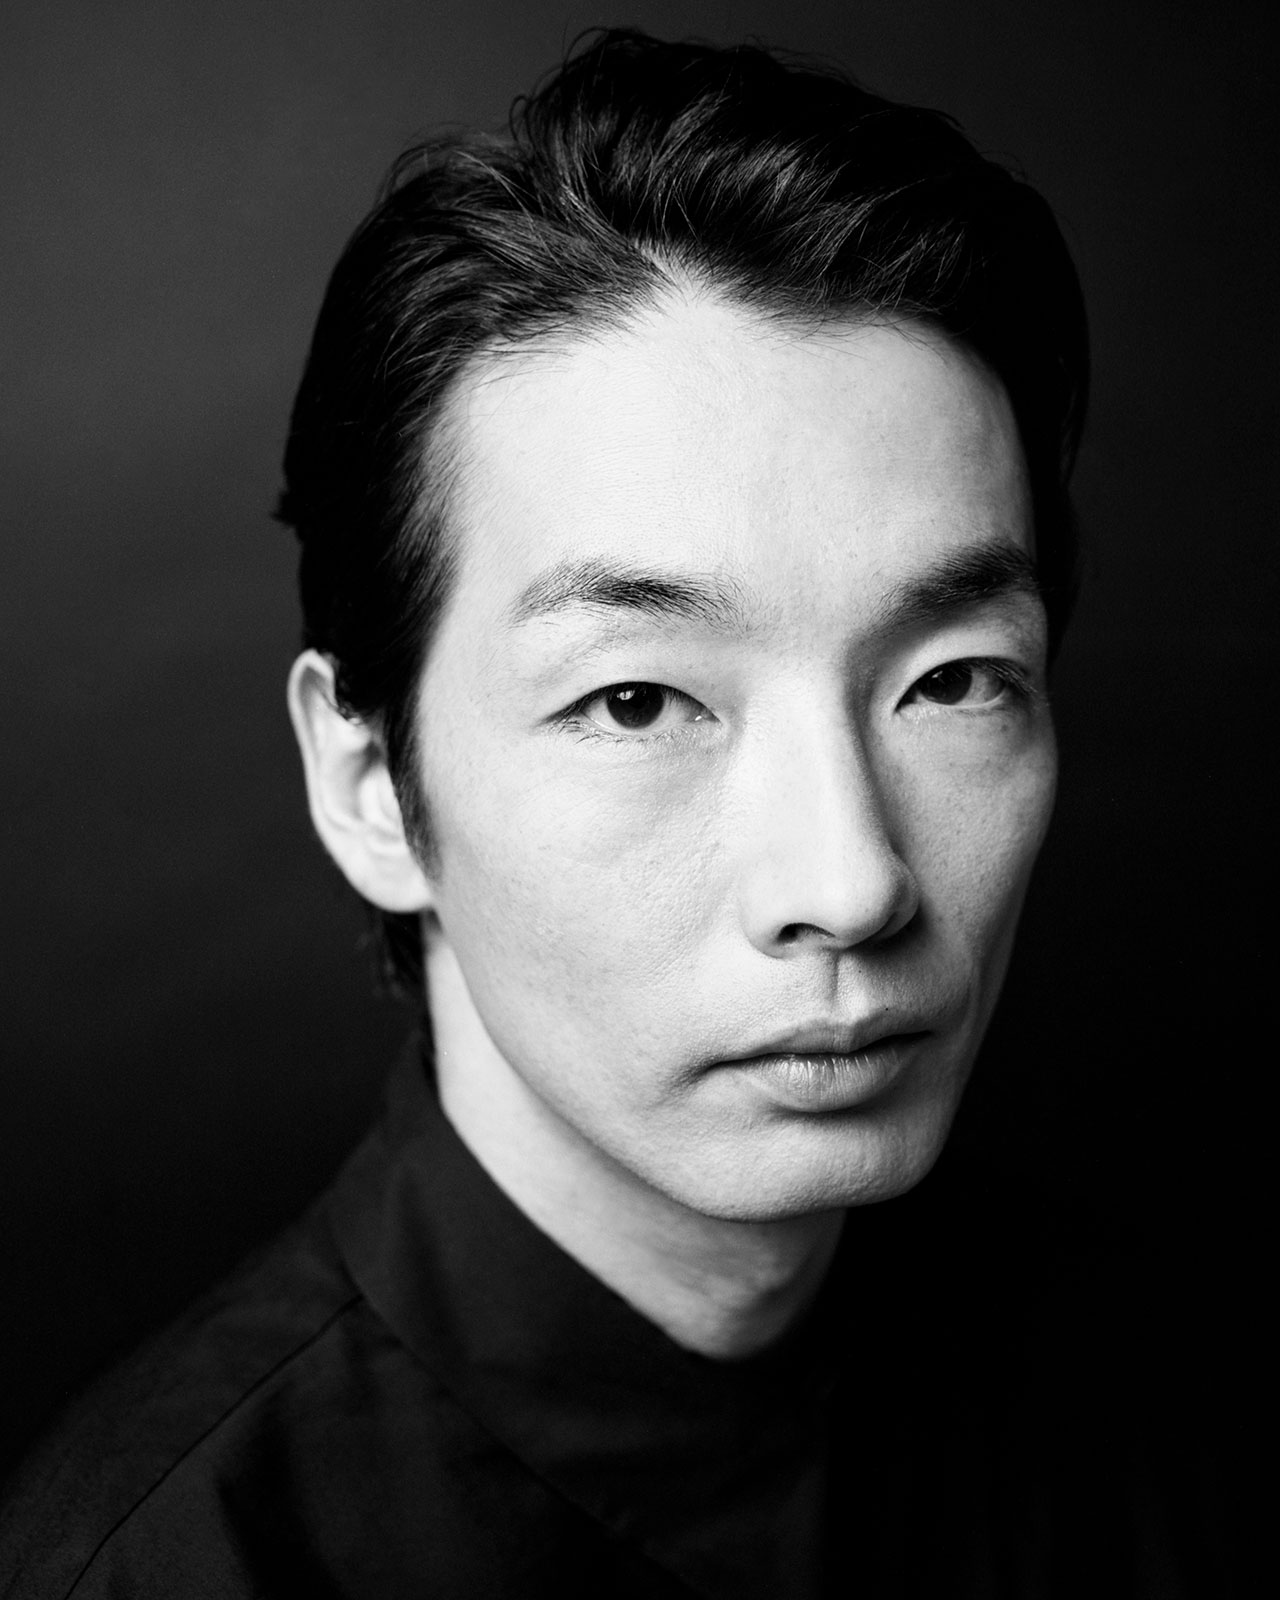 Photo by Tetsuo Kashiwada